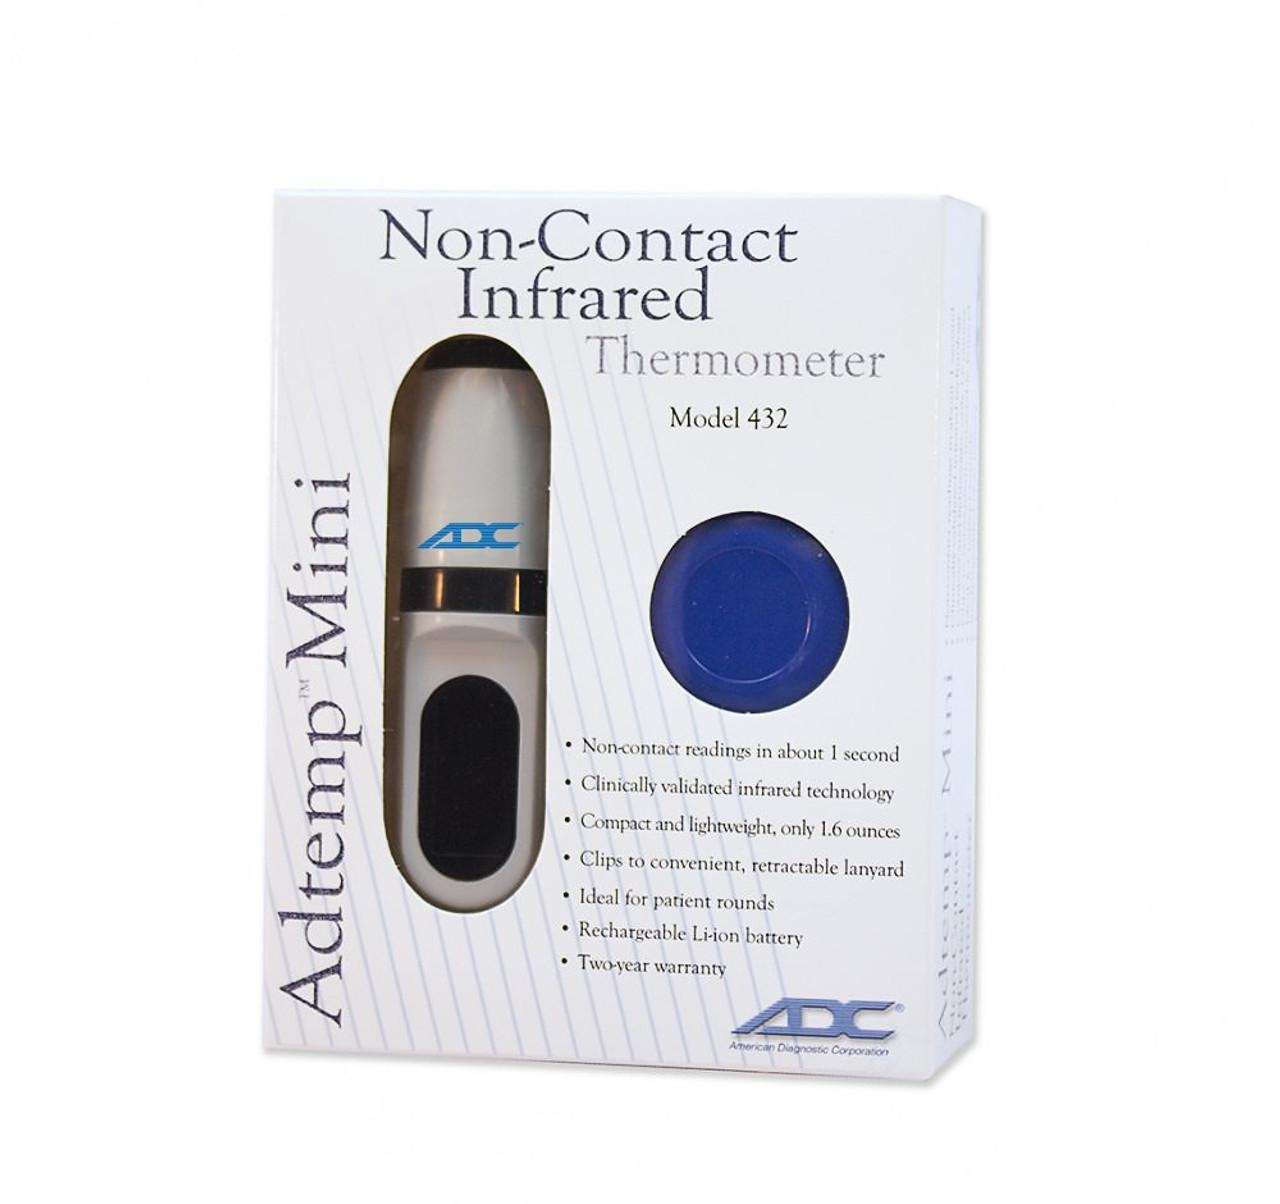 ADC 432 ADTEMP Mini NC Thermometer